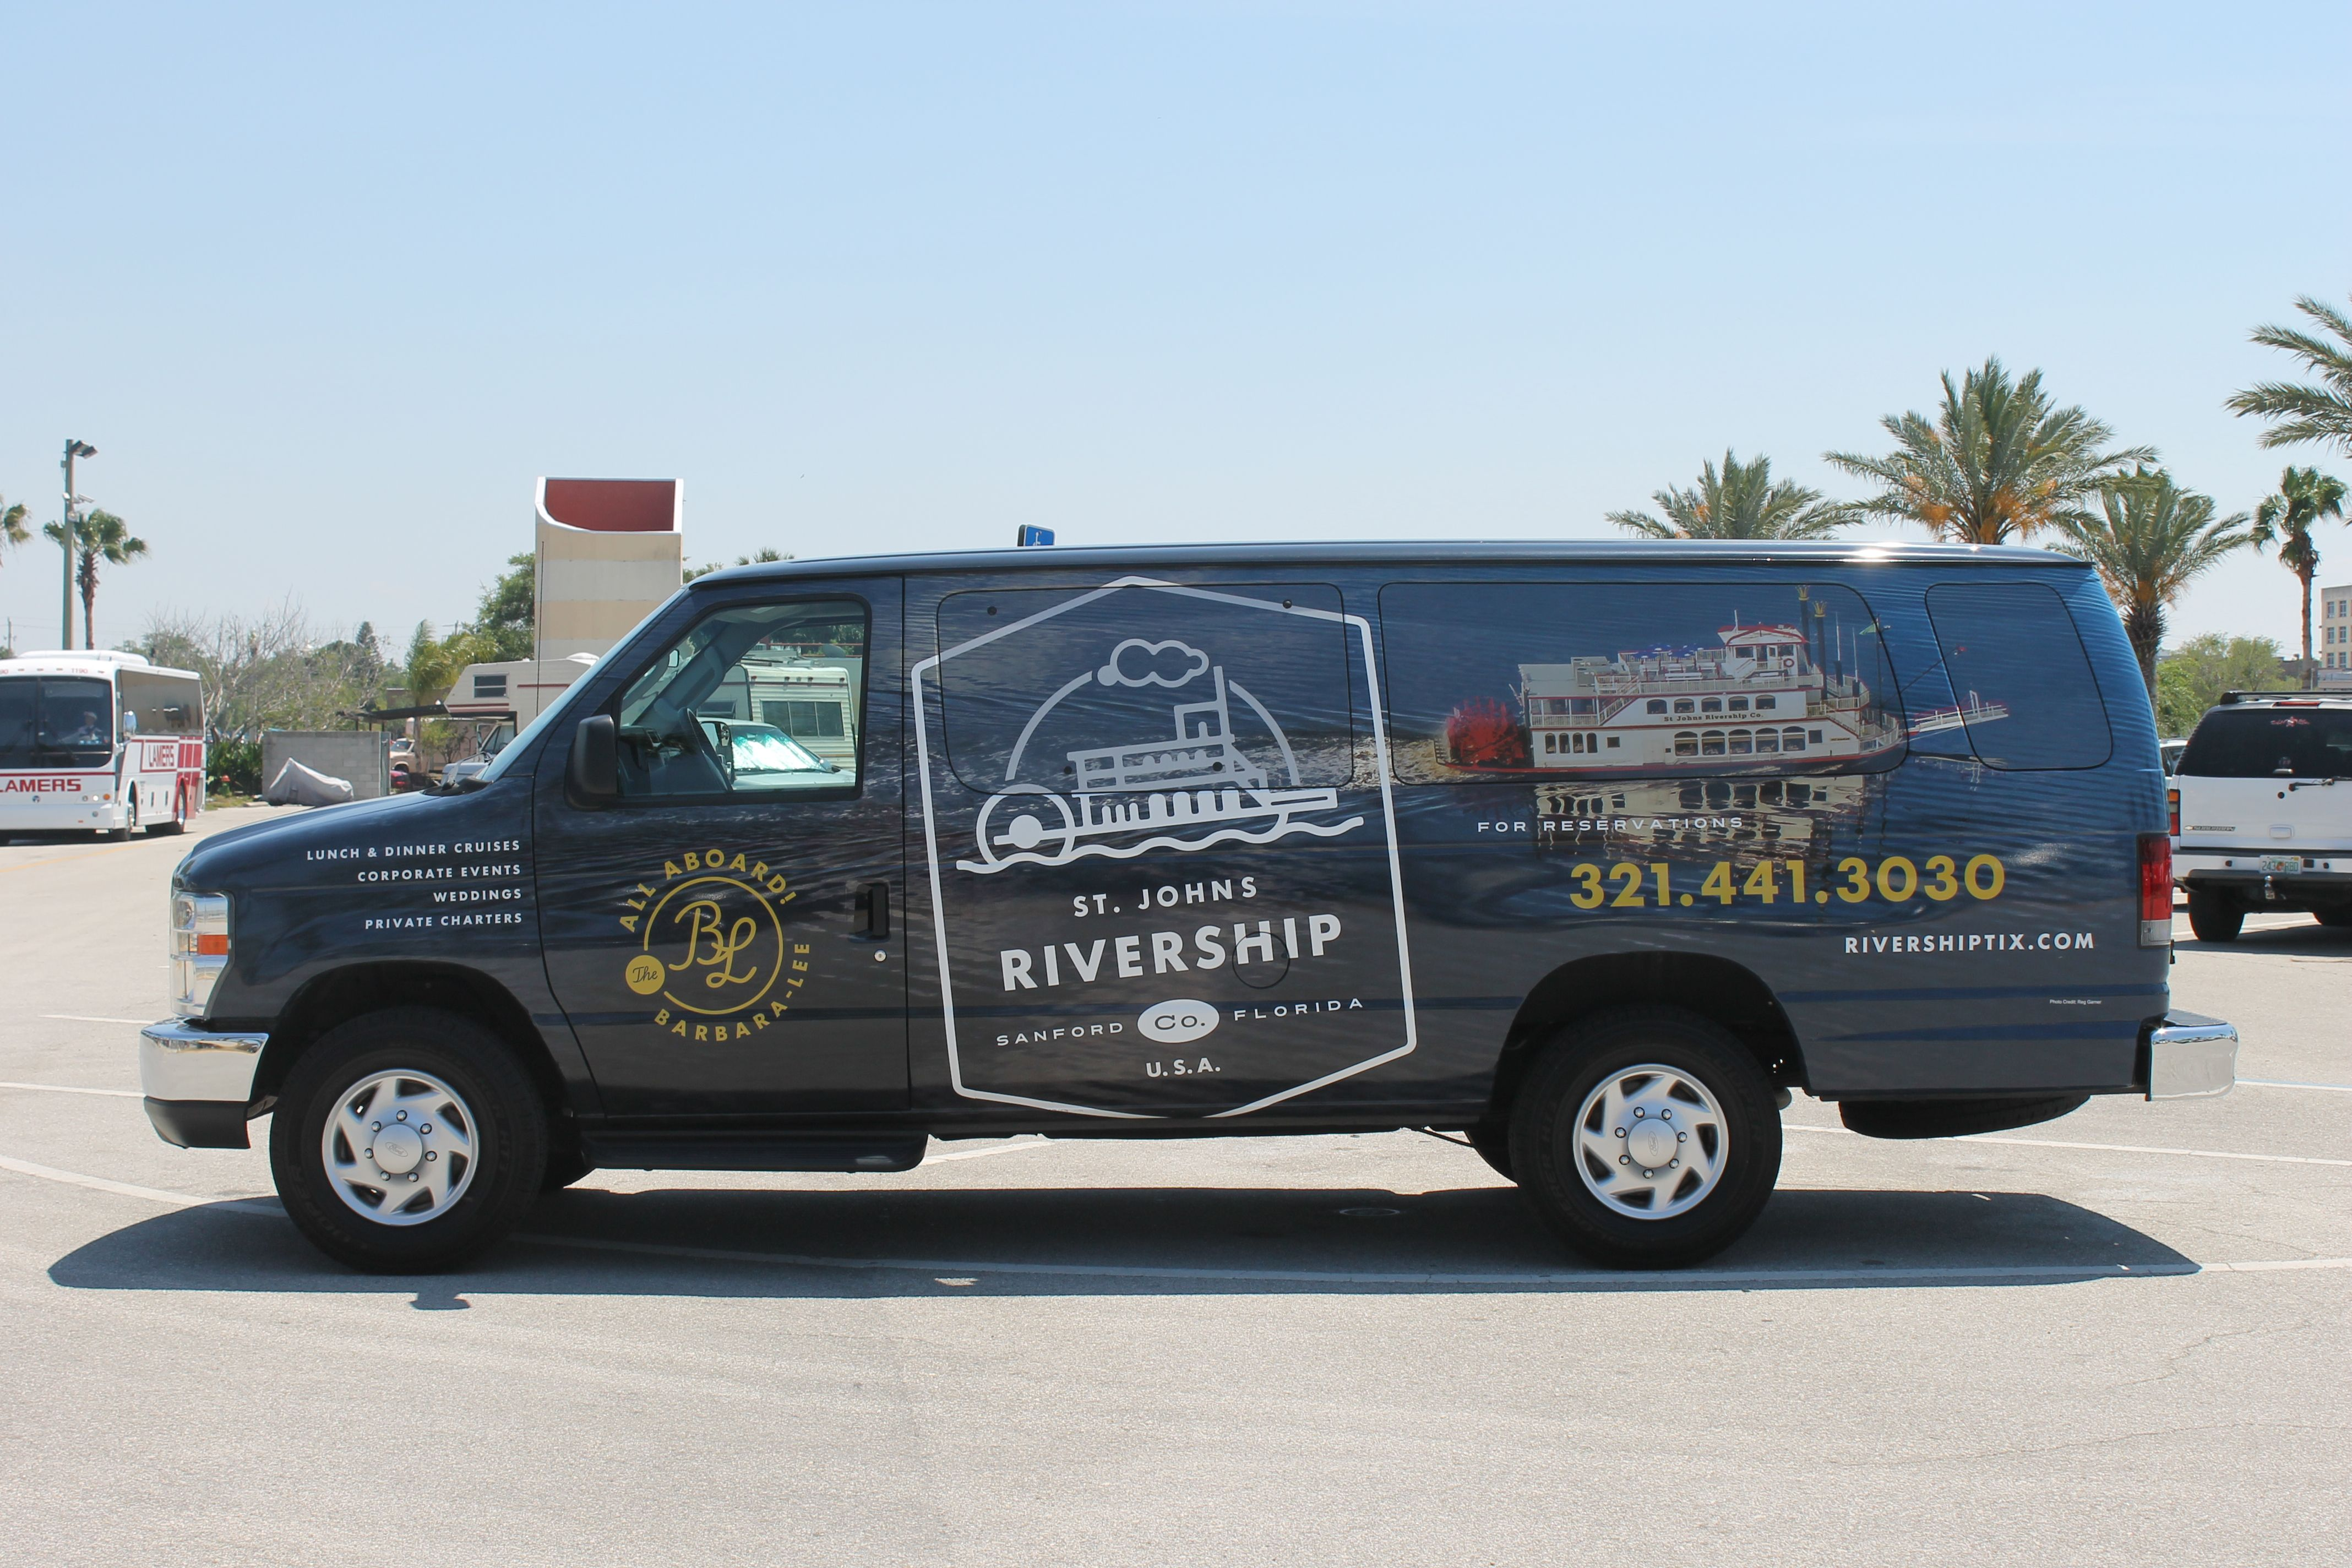 St John's River Cruise company